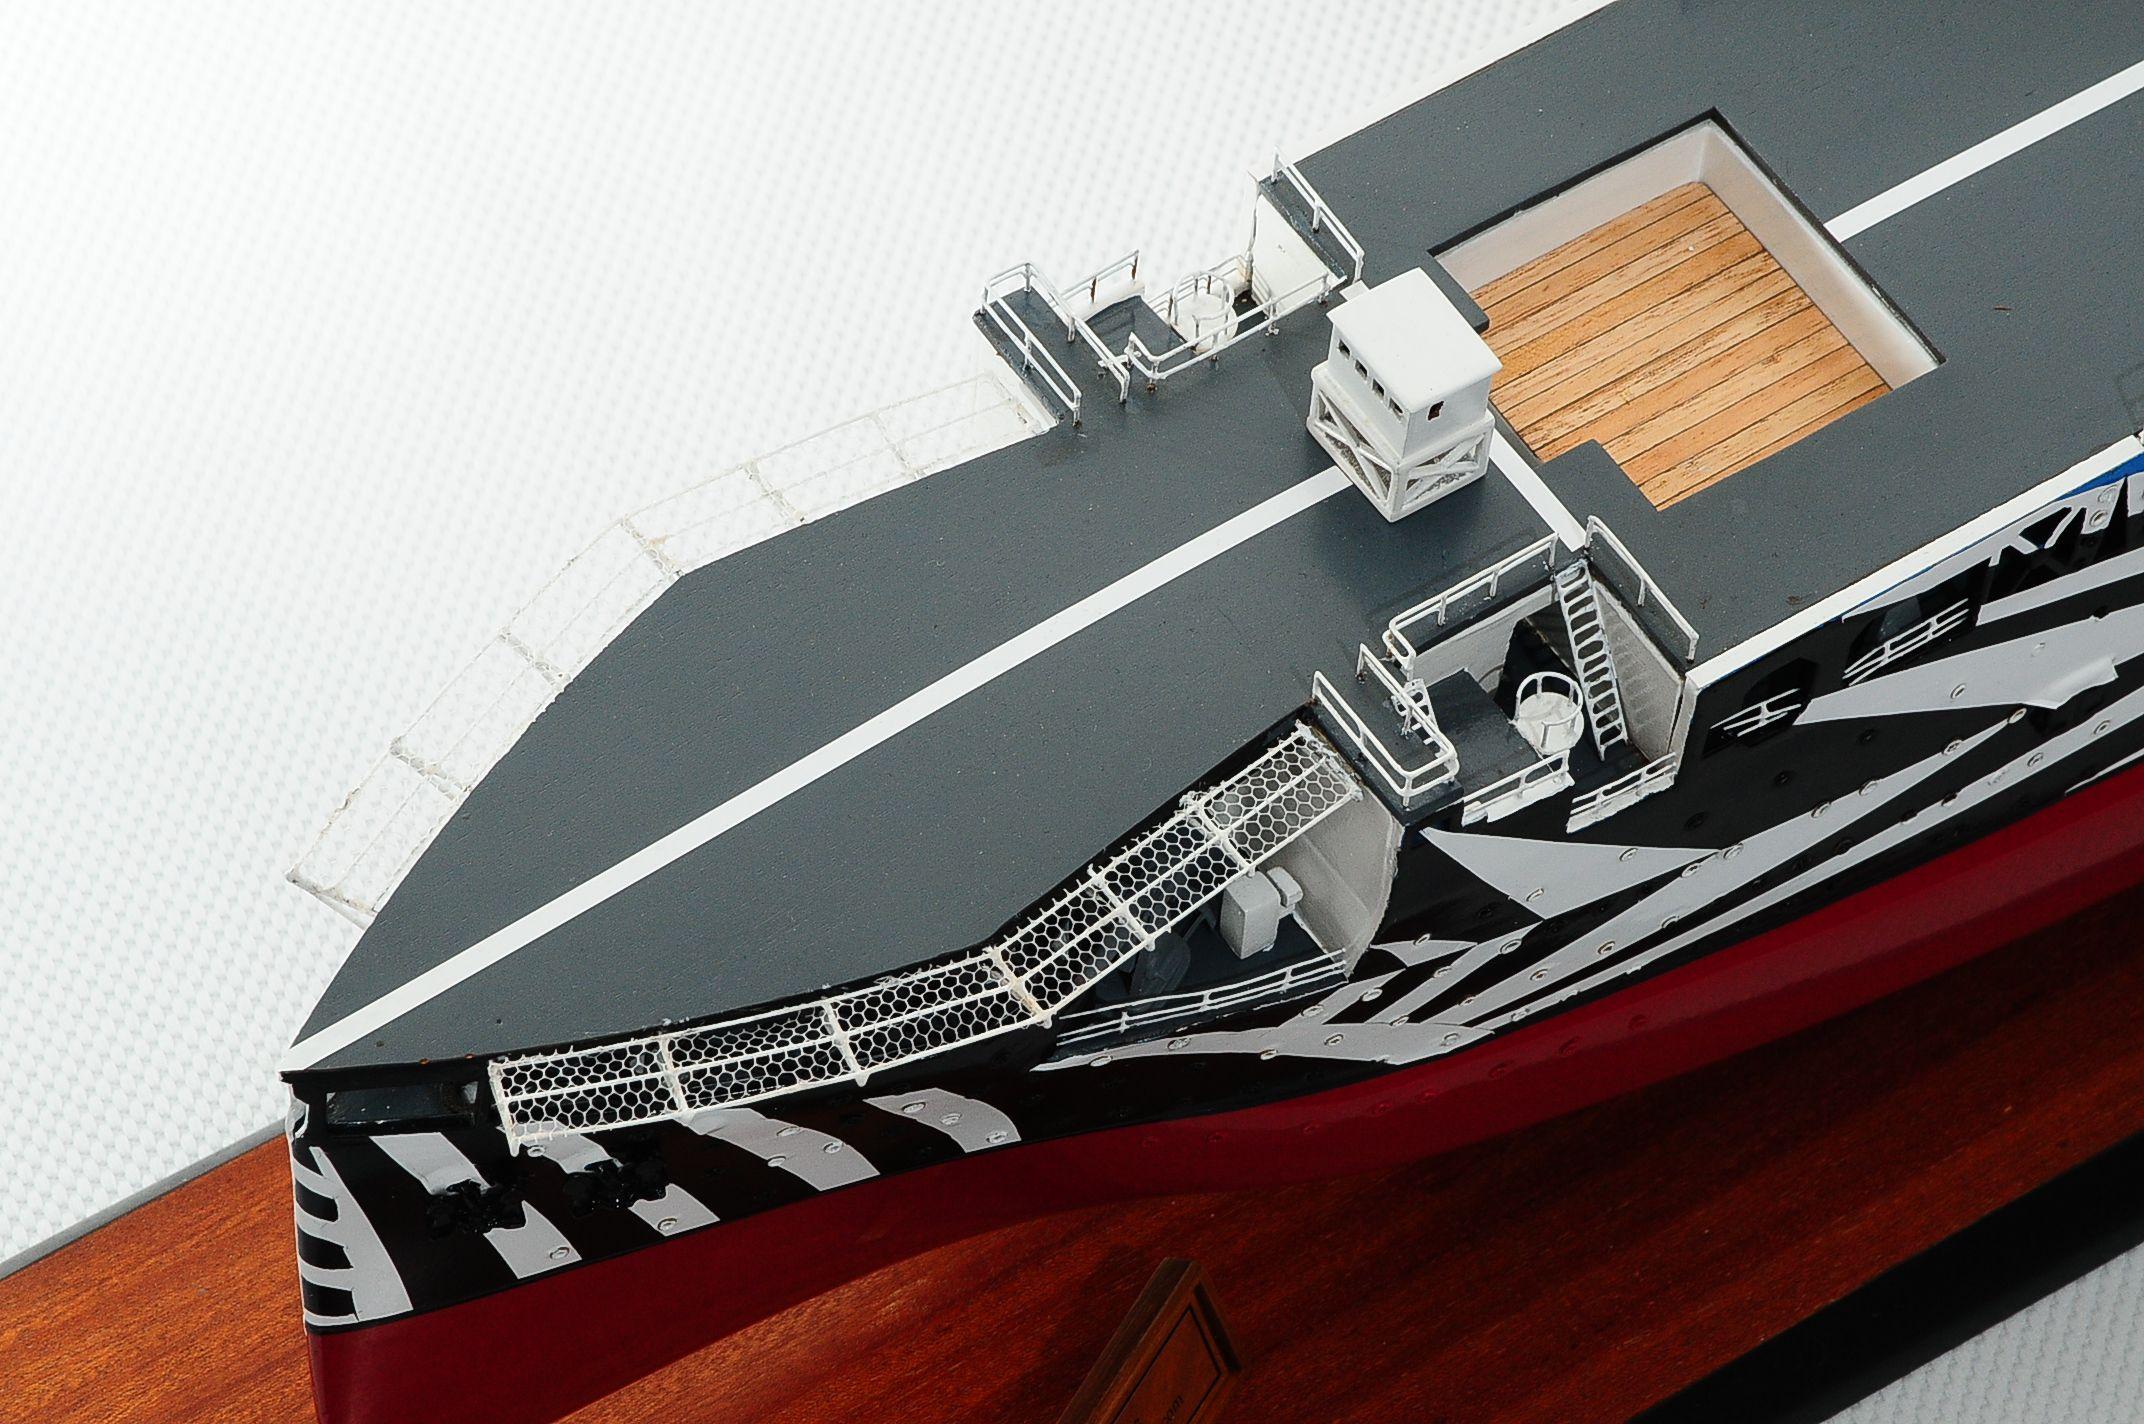 663-6133-HMS-Argus-Model-Boat